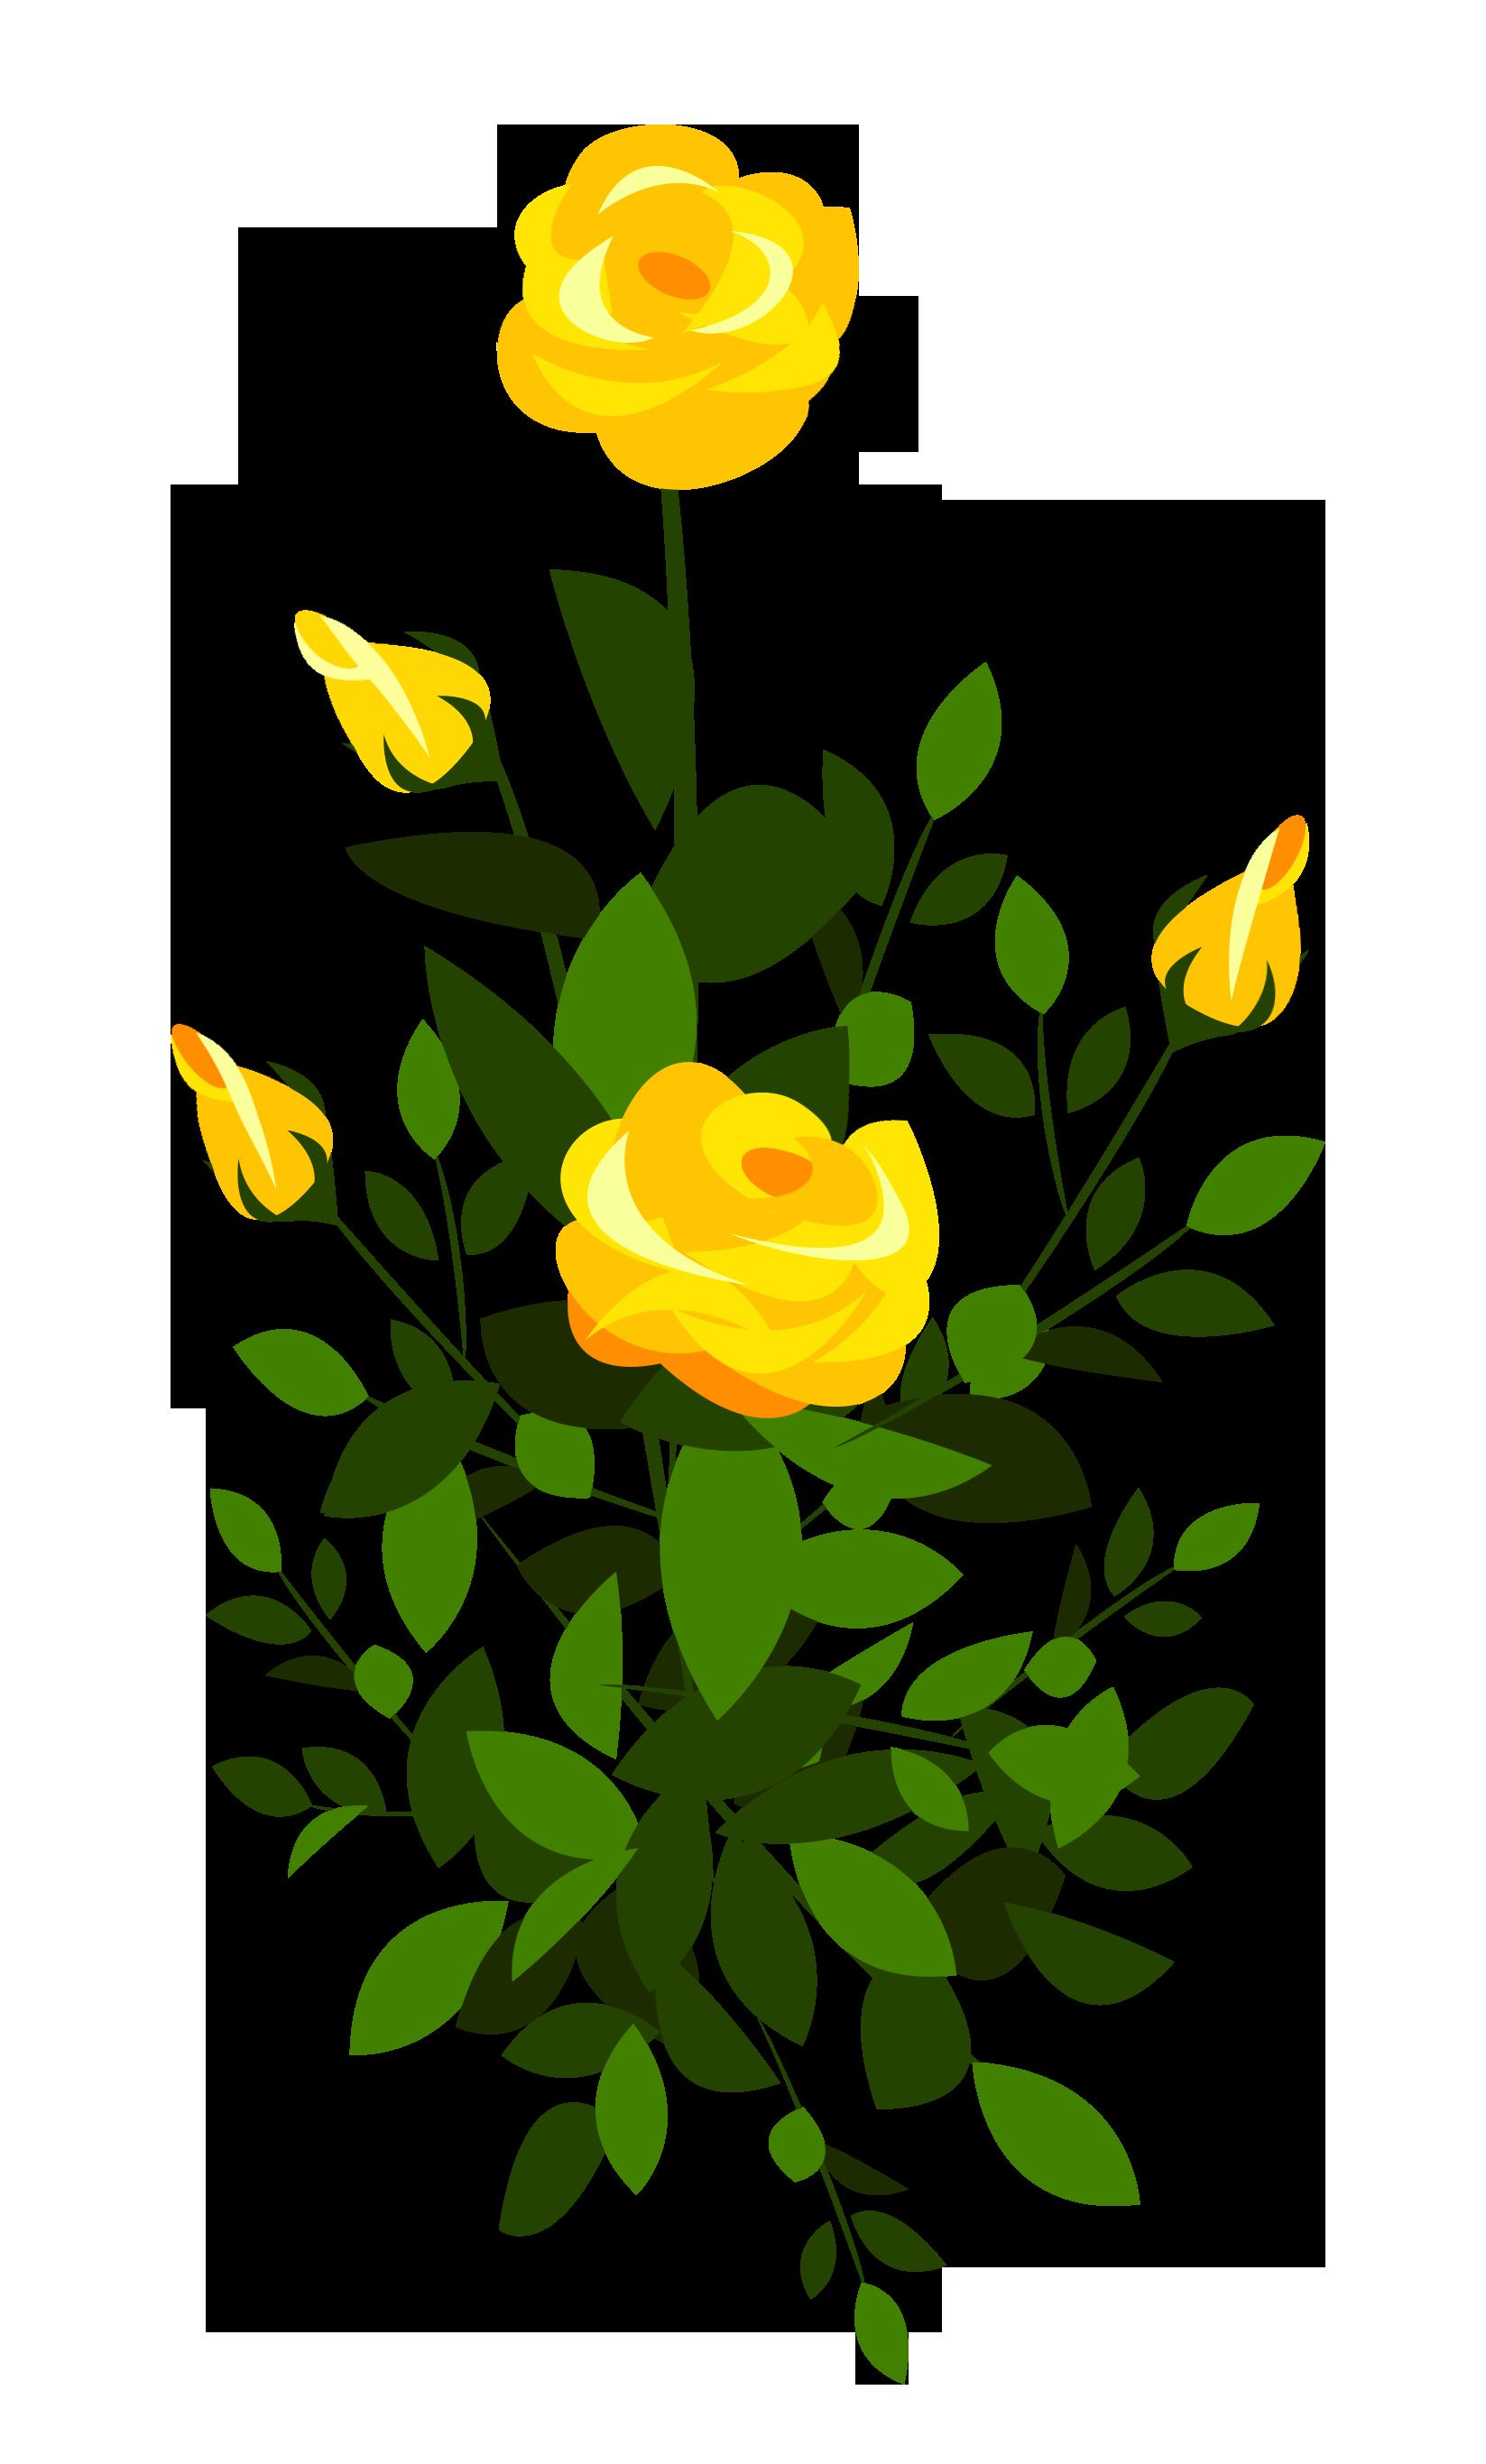 Rose clipart rose plant #5